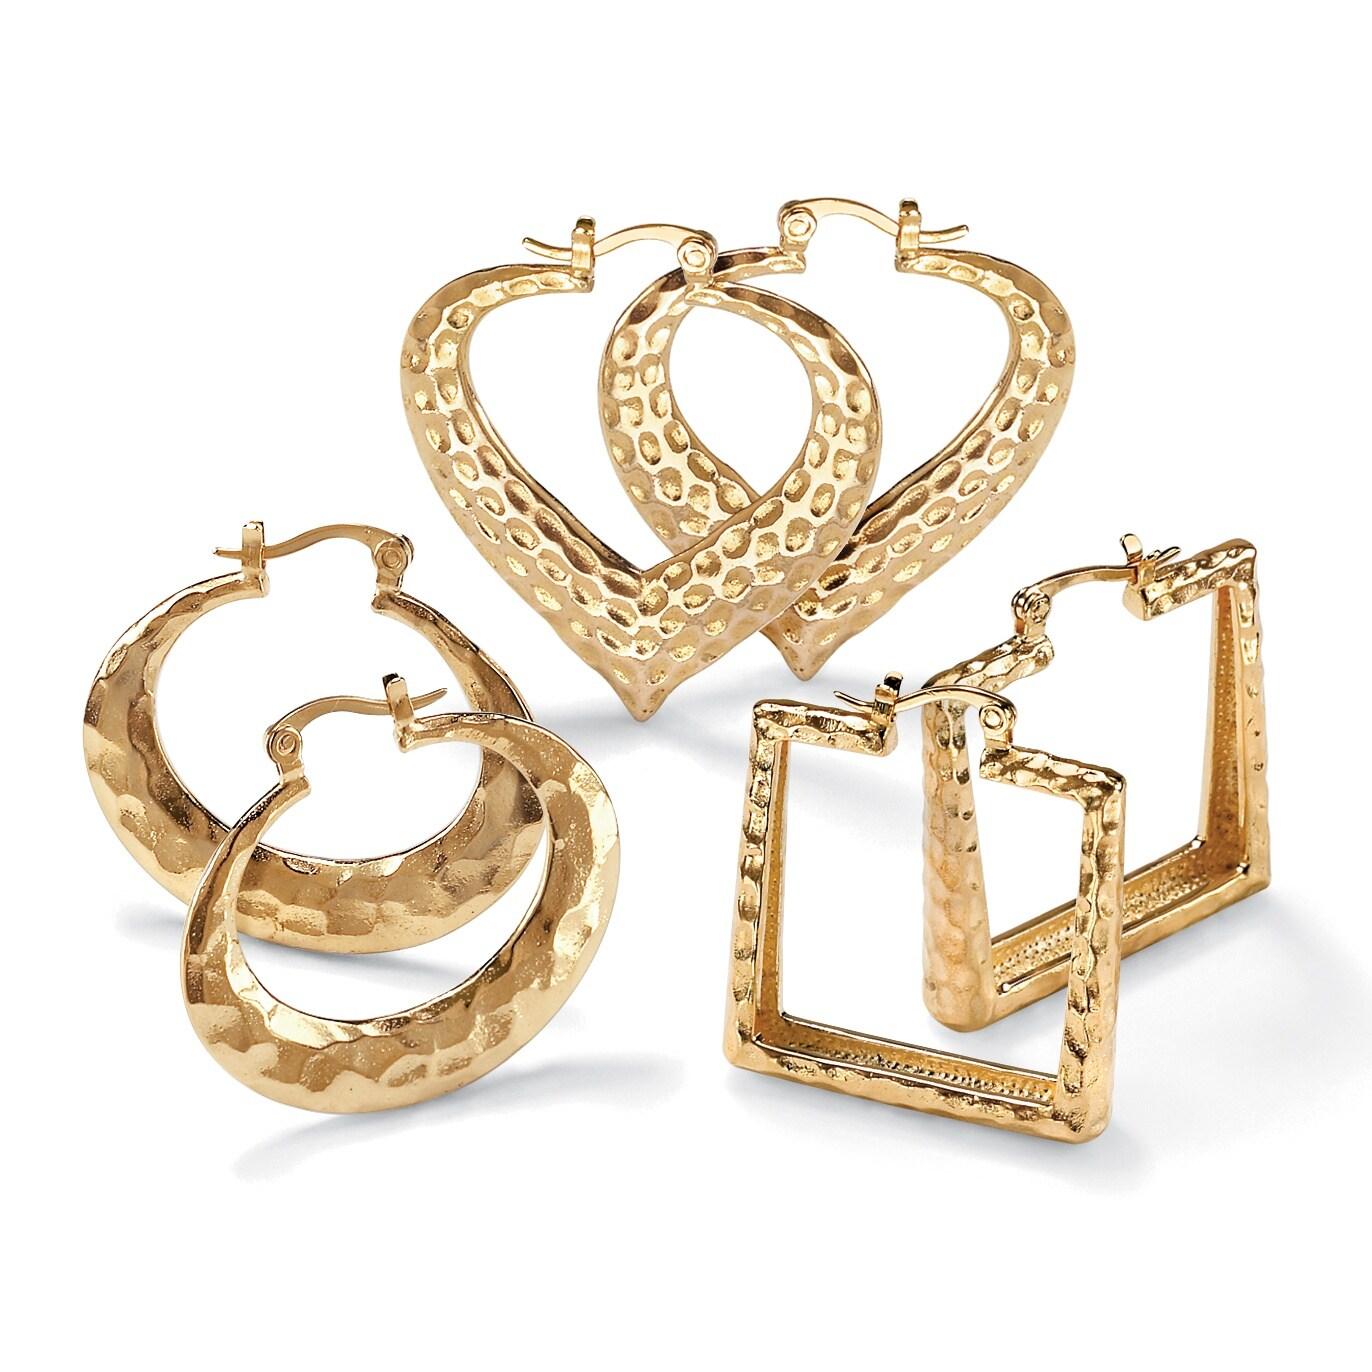 PalmBeach 14k Goldplated High Polish 3-Pair Hoop Earring Set Tailored